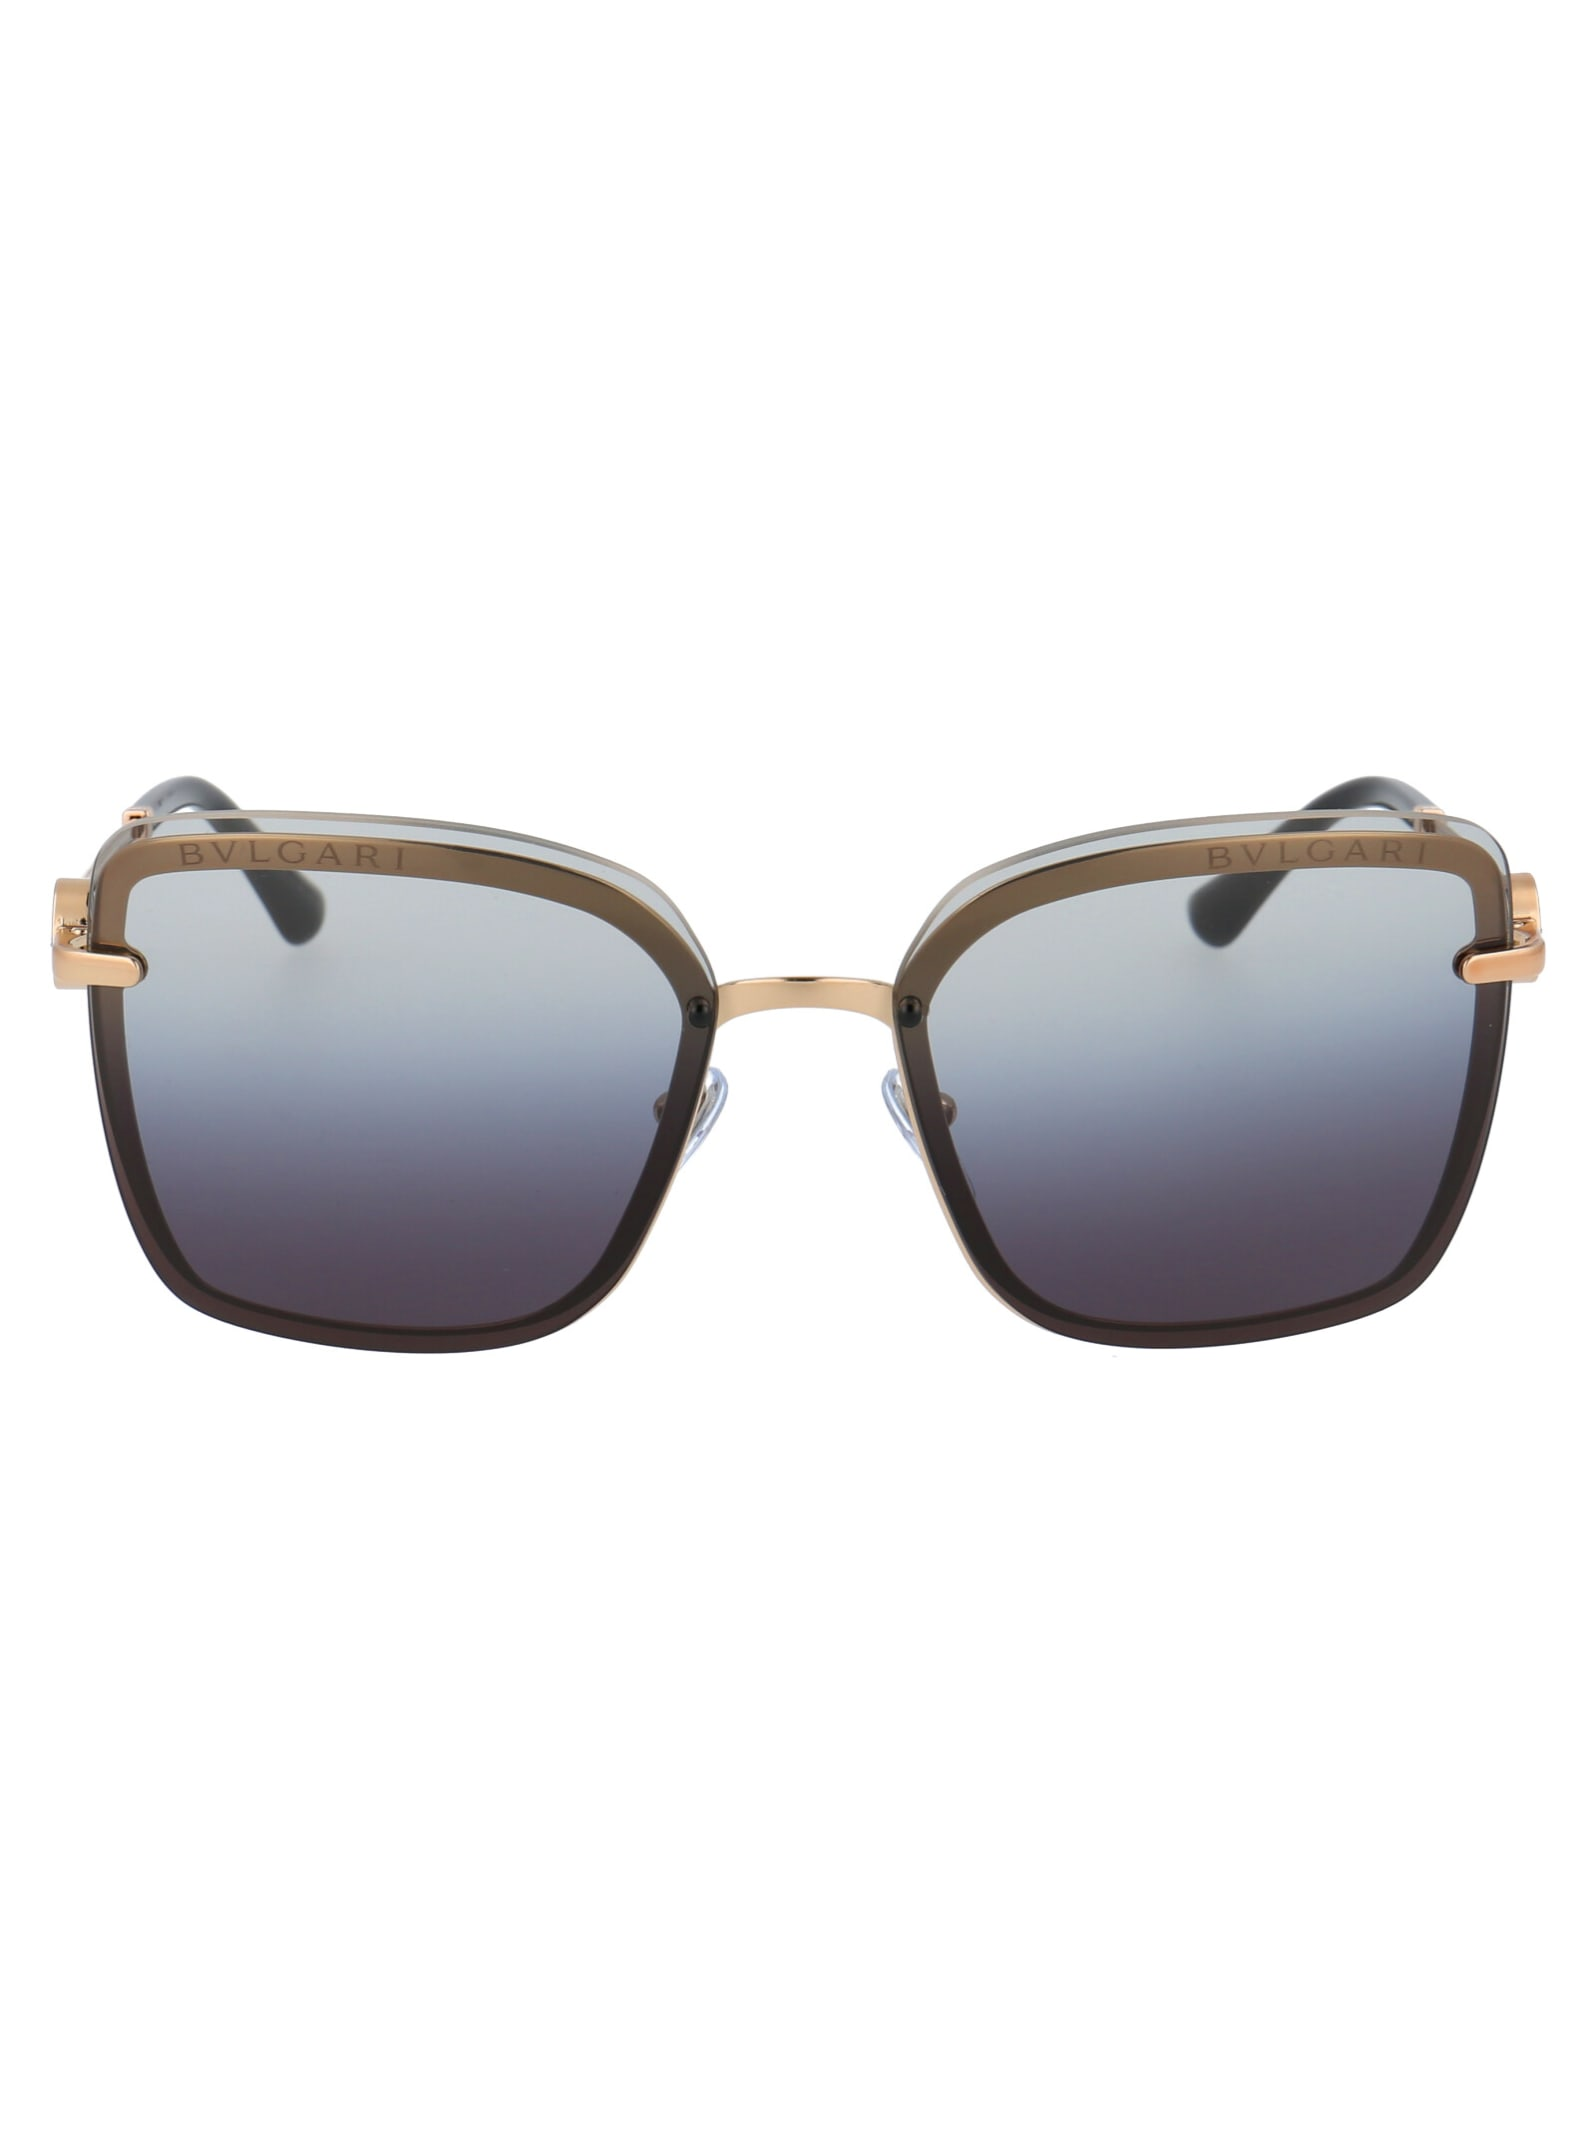 0bv6151b Sunglasses